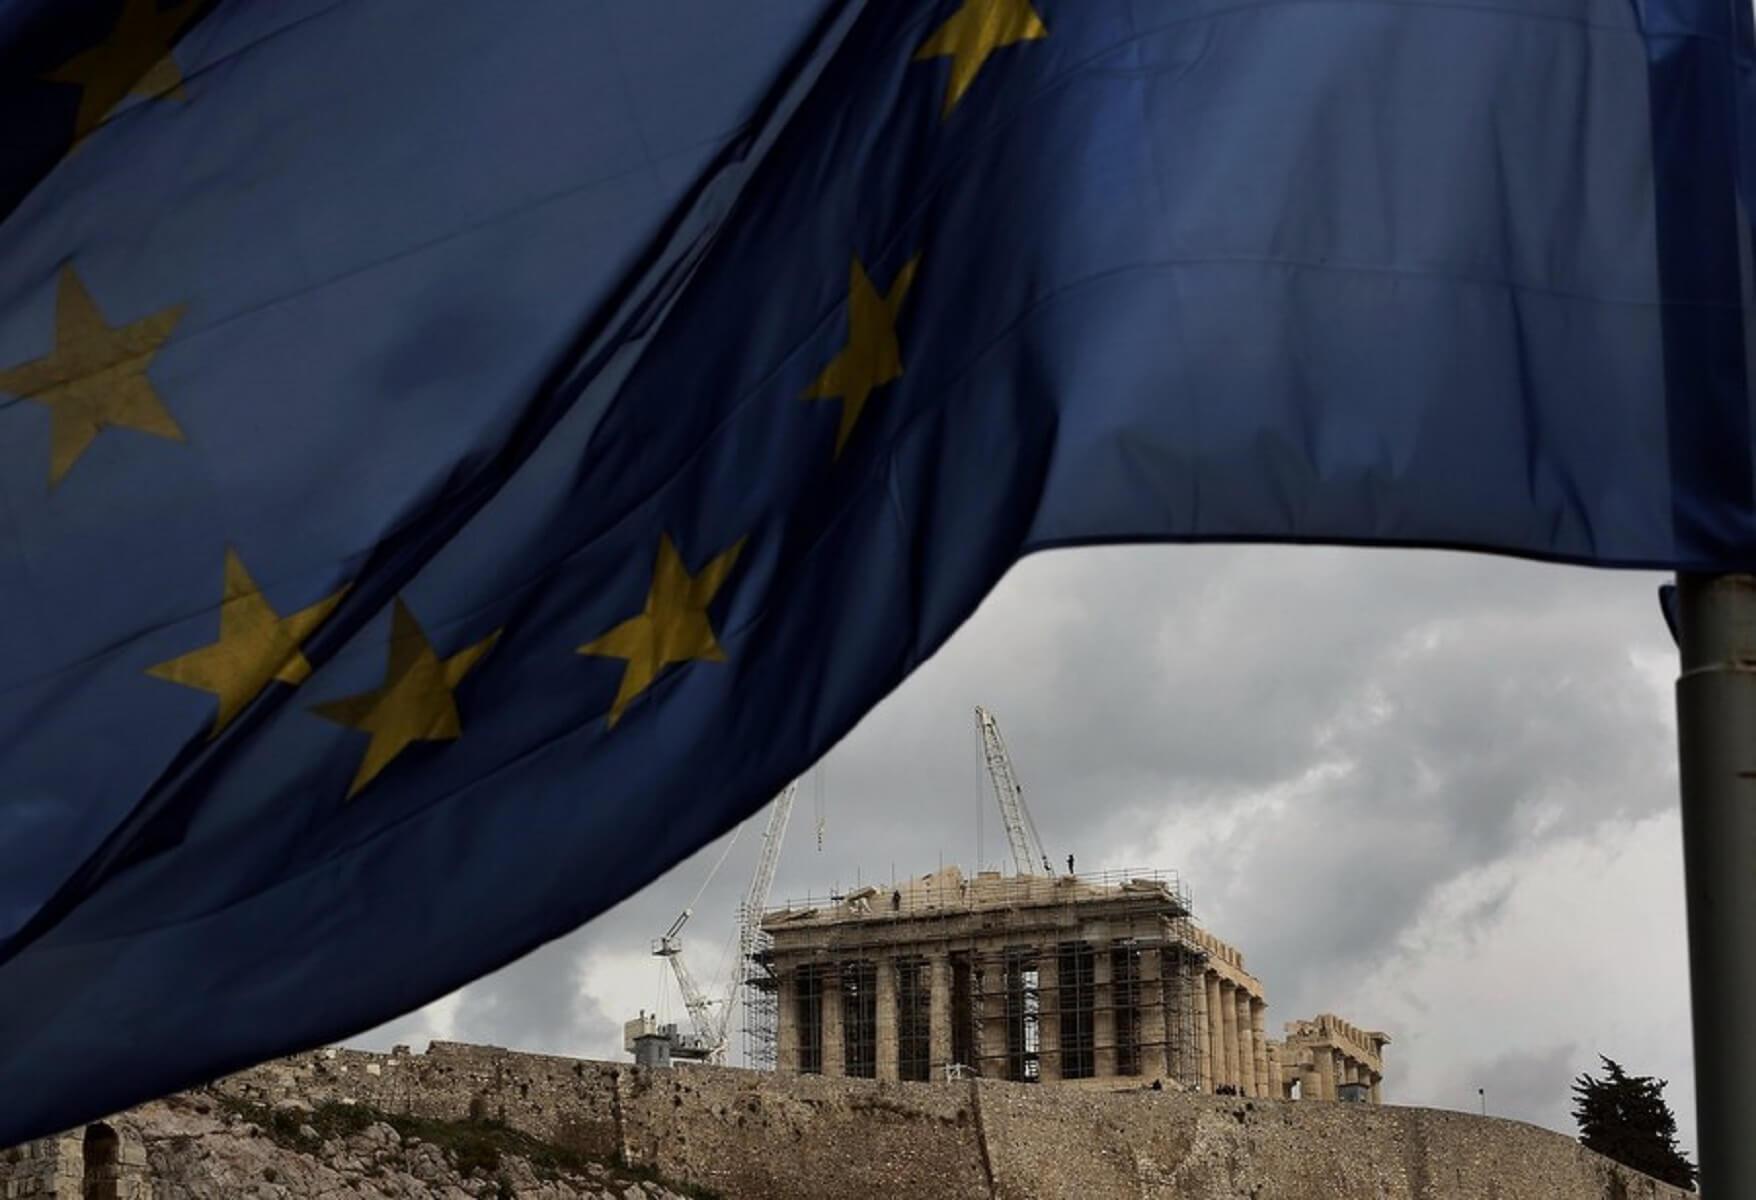 Eurostat: Αύξηση ΑΕΠ και απασχόλησης στην Ελλάδα το πρώτο τρίμηνο του 2019